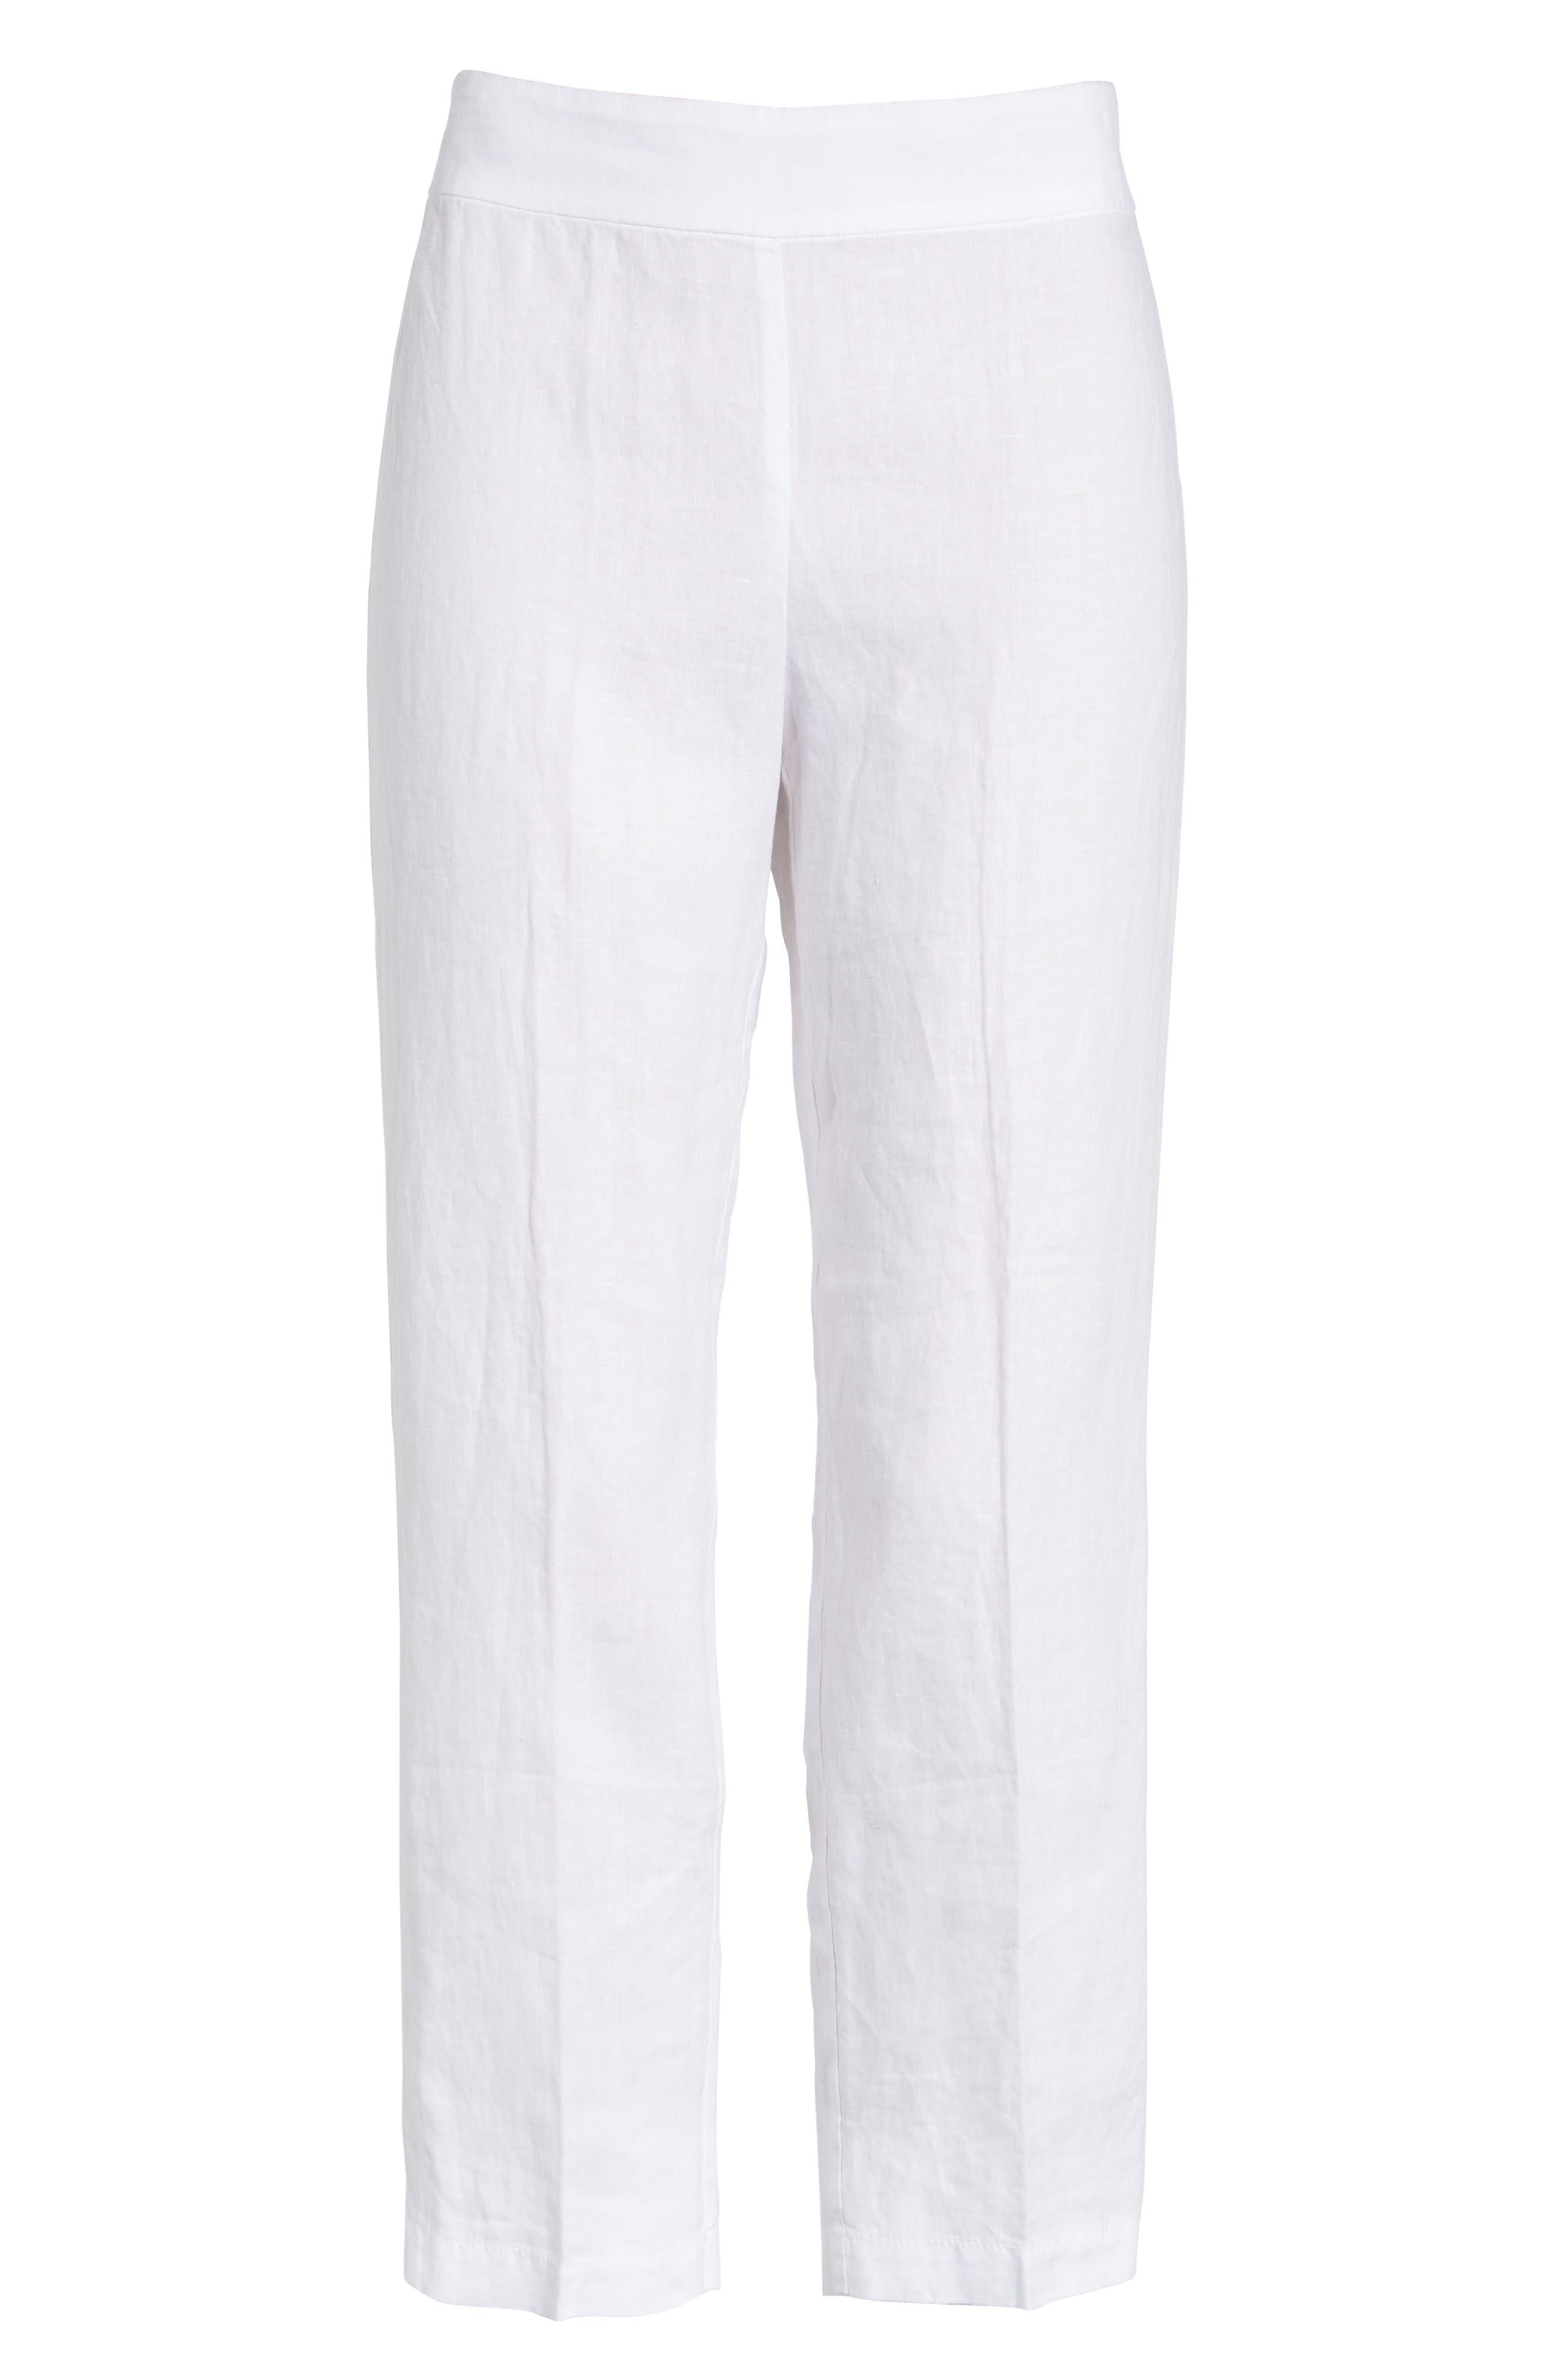 Organic Linen Crop Pants,                             Alternate thumbnail 3, color,                             100